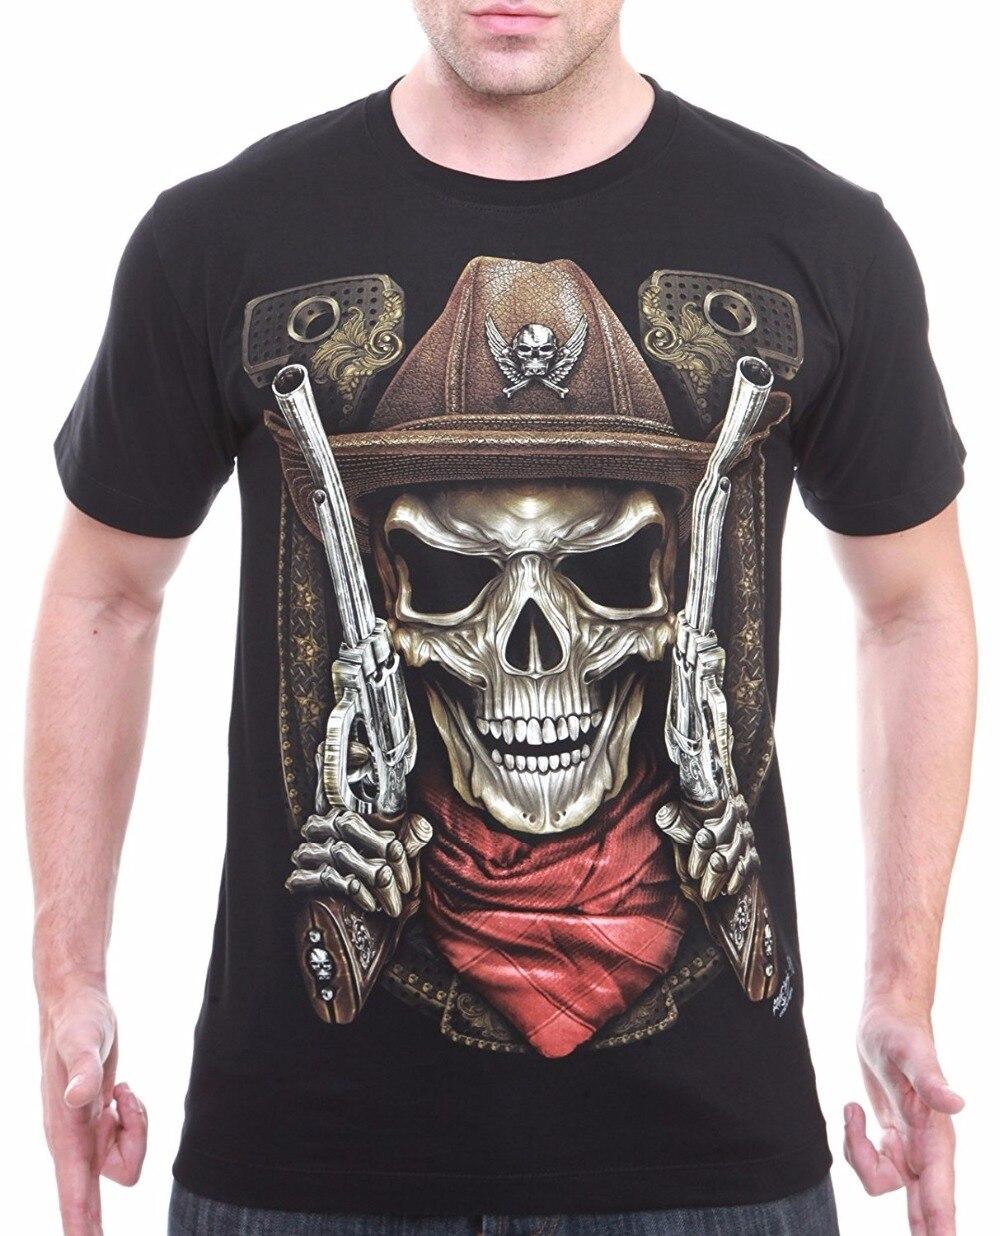 Printed T Shirts Hipster Tee Short Sleeve Print Cowboy Skull Gun Men T-Shirt Biker Moto Gangster Tattoo Jeans Crew Neck Mens Tee